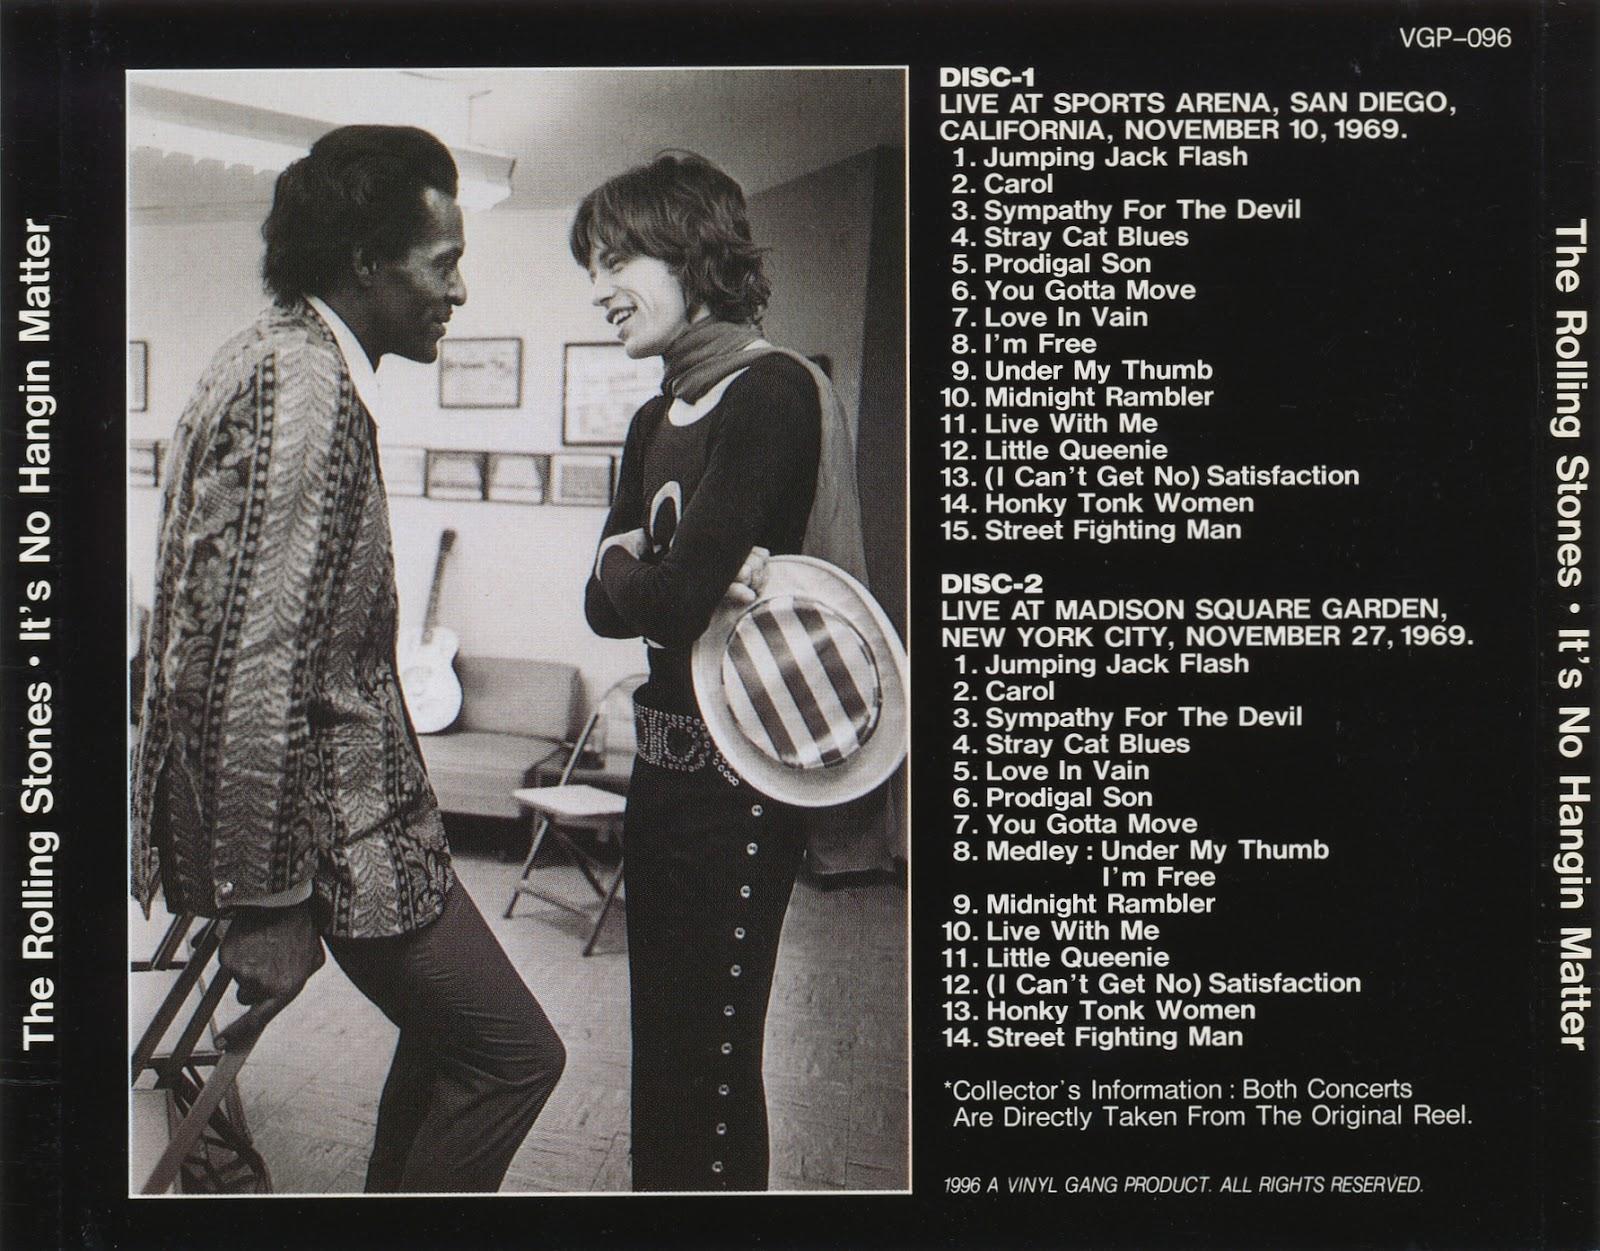 Bootleg Rambler: The Rolling Stones - 1969-11-10 San Diego